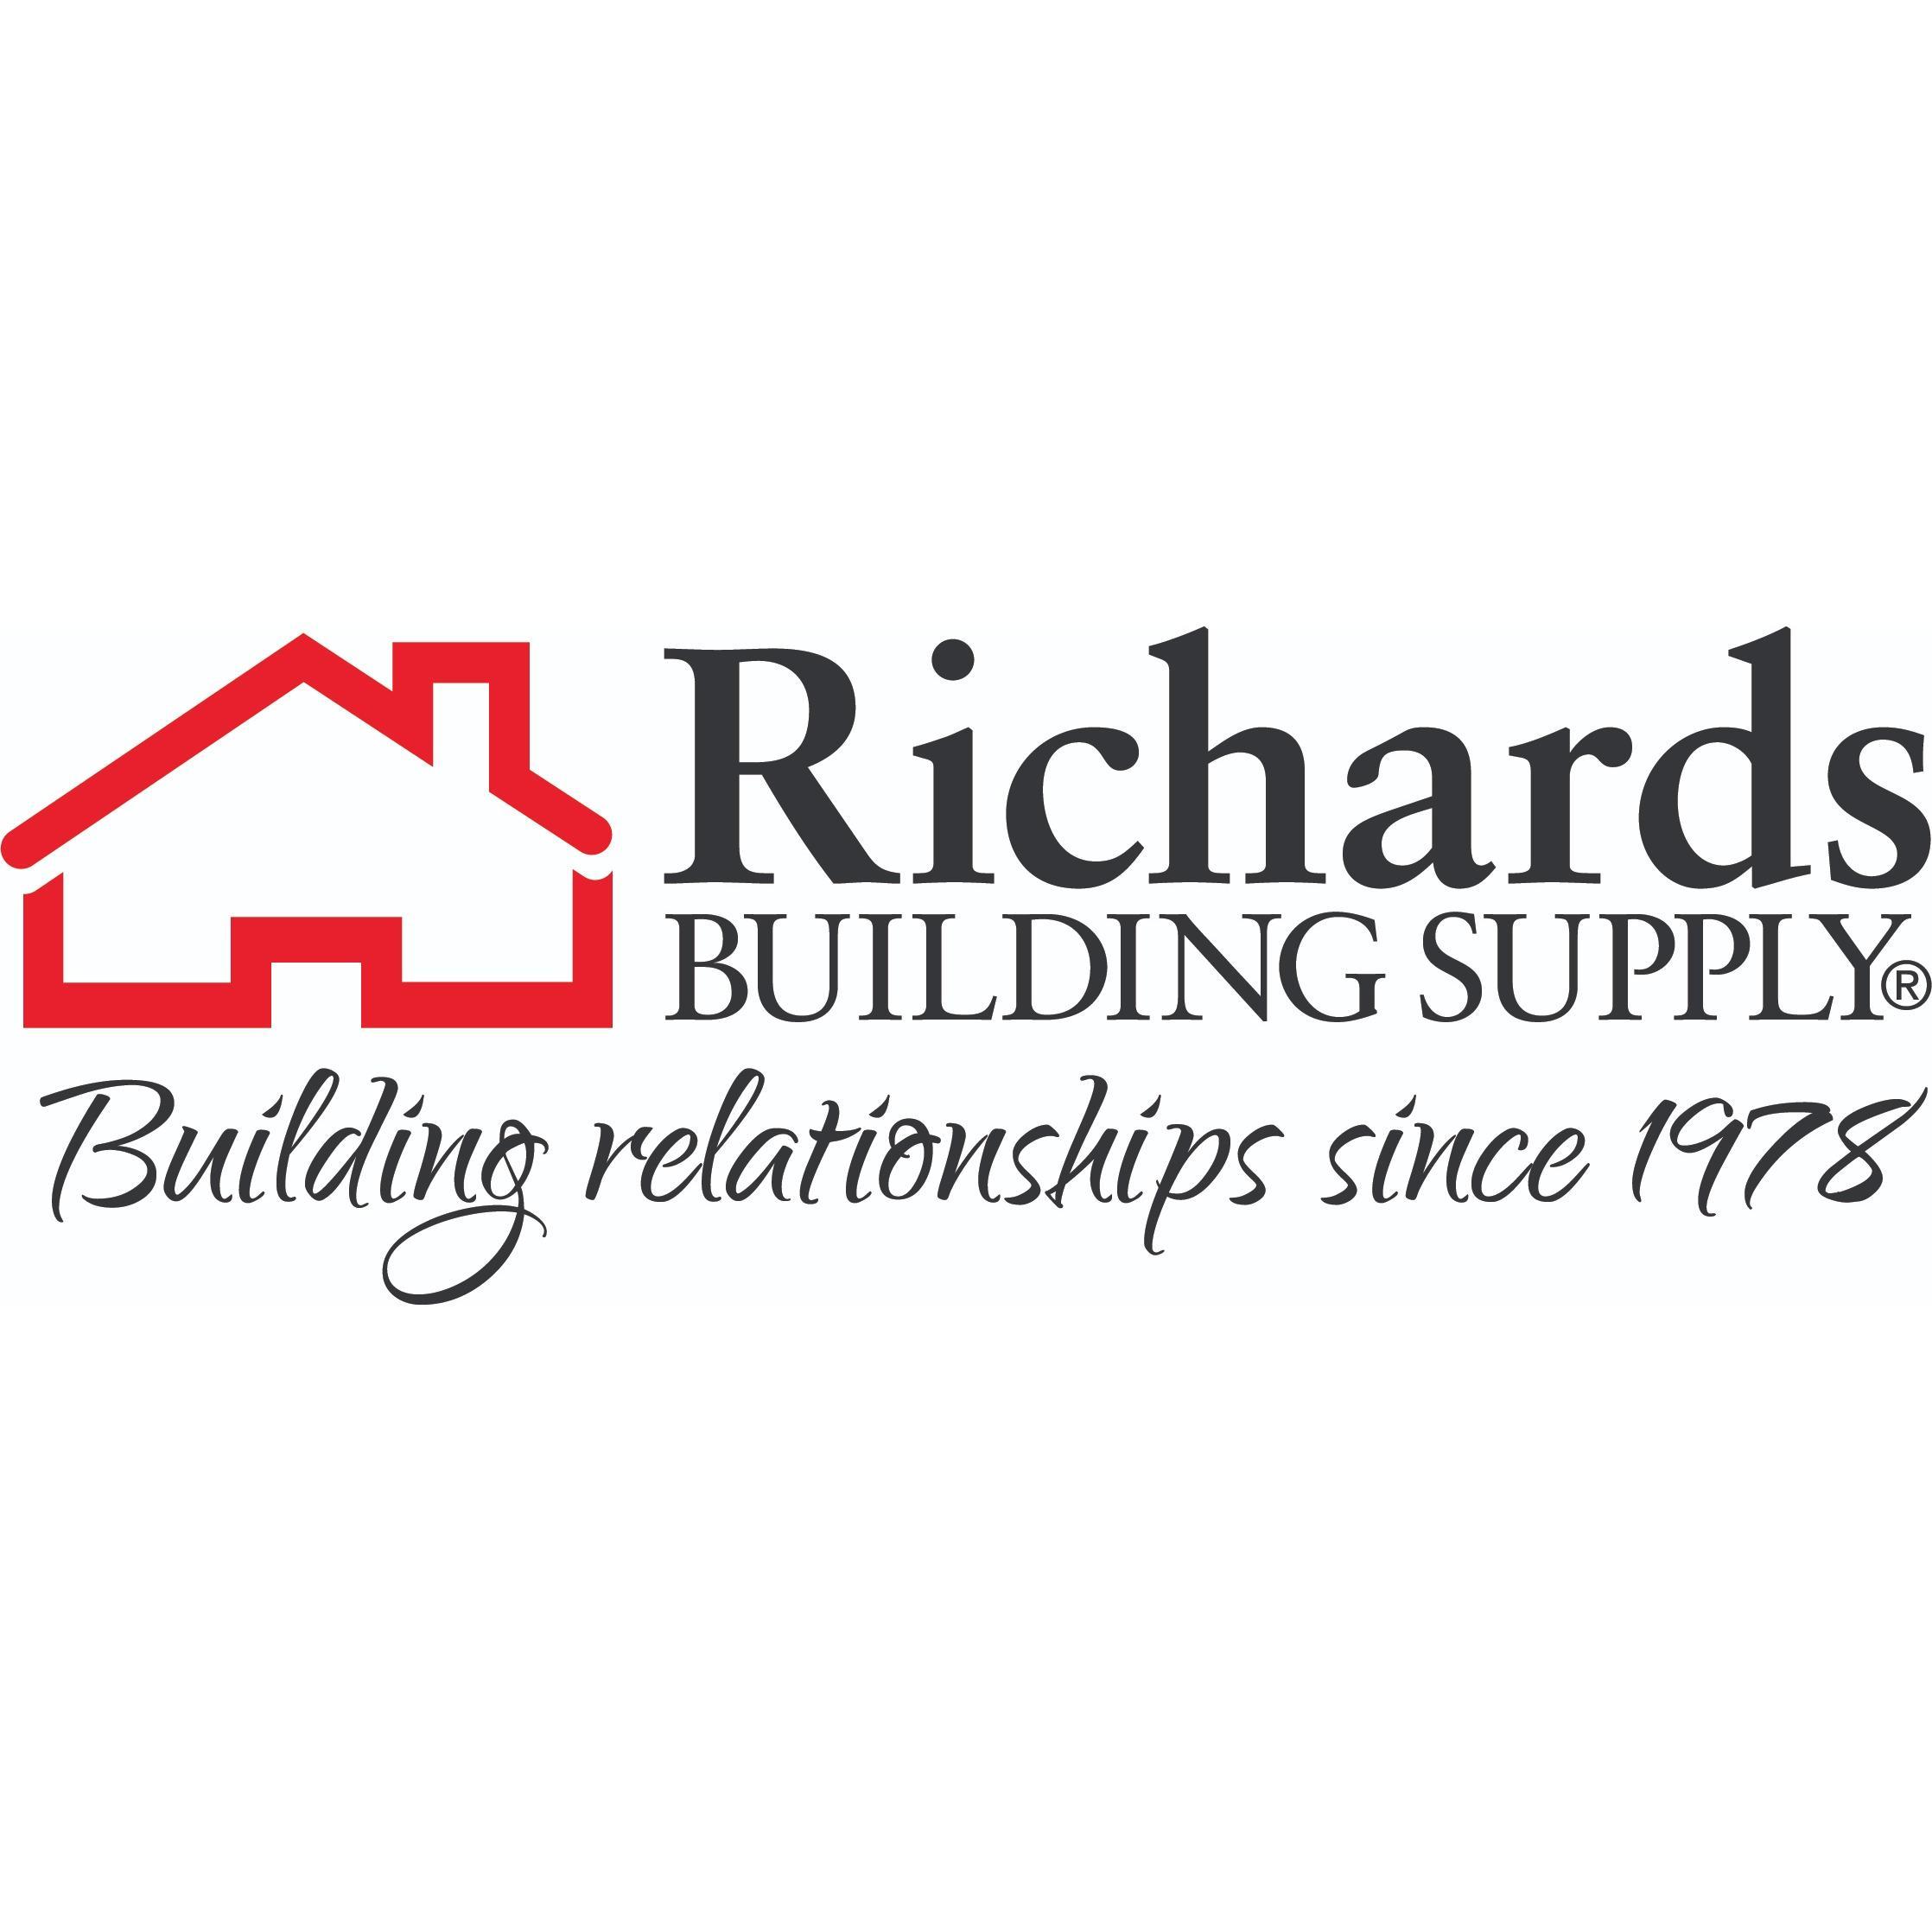 Richards Building Supply - Muskegon, MI 49442 - (231)728-5555 | ShowMeLocal.com